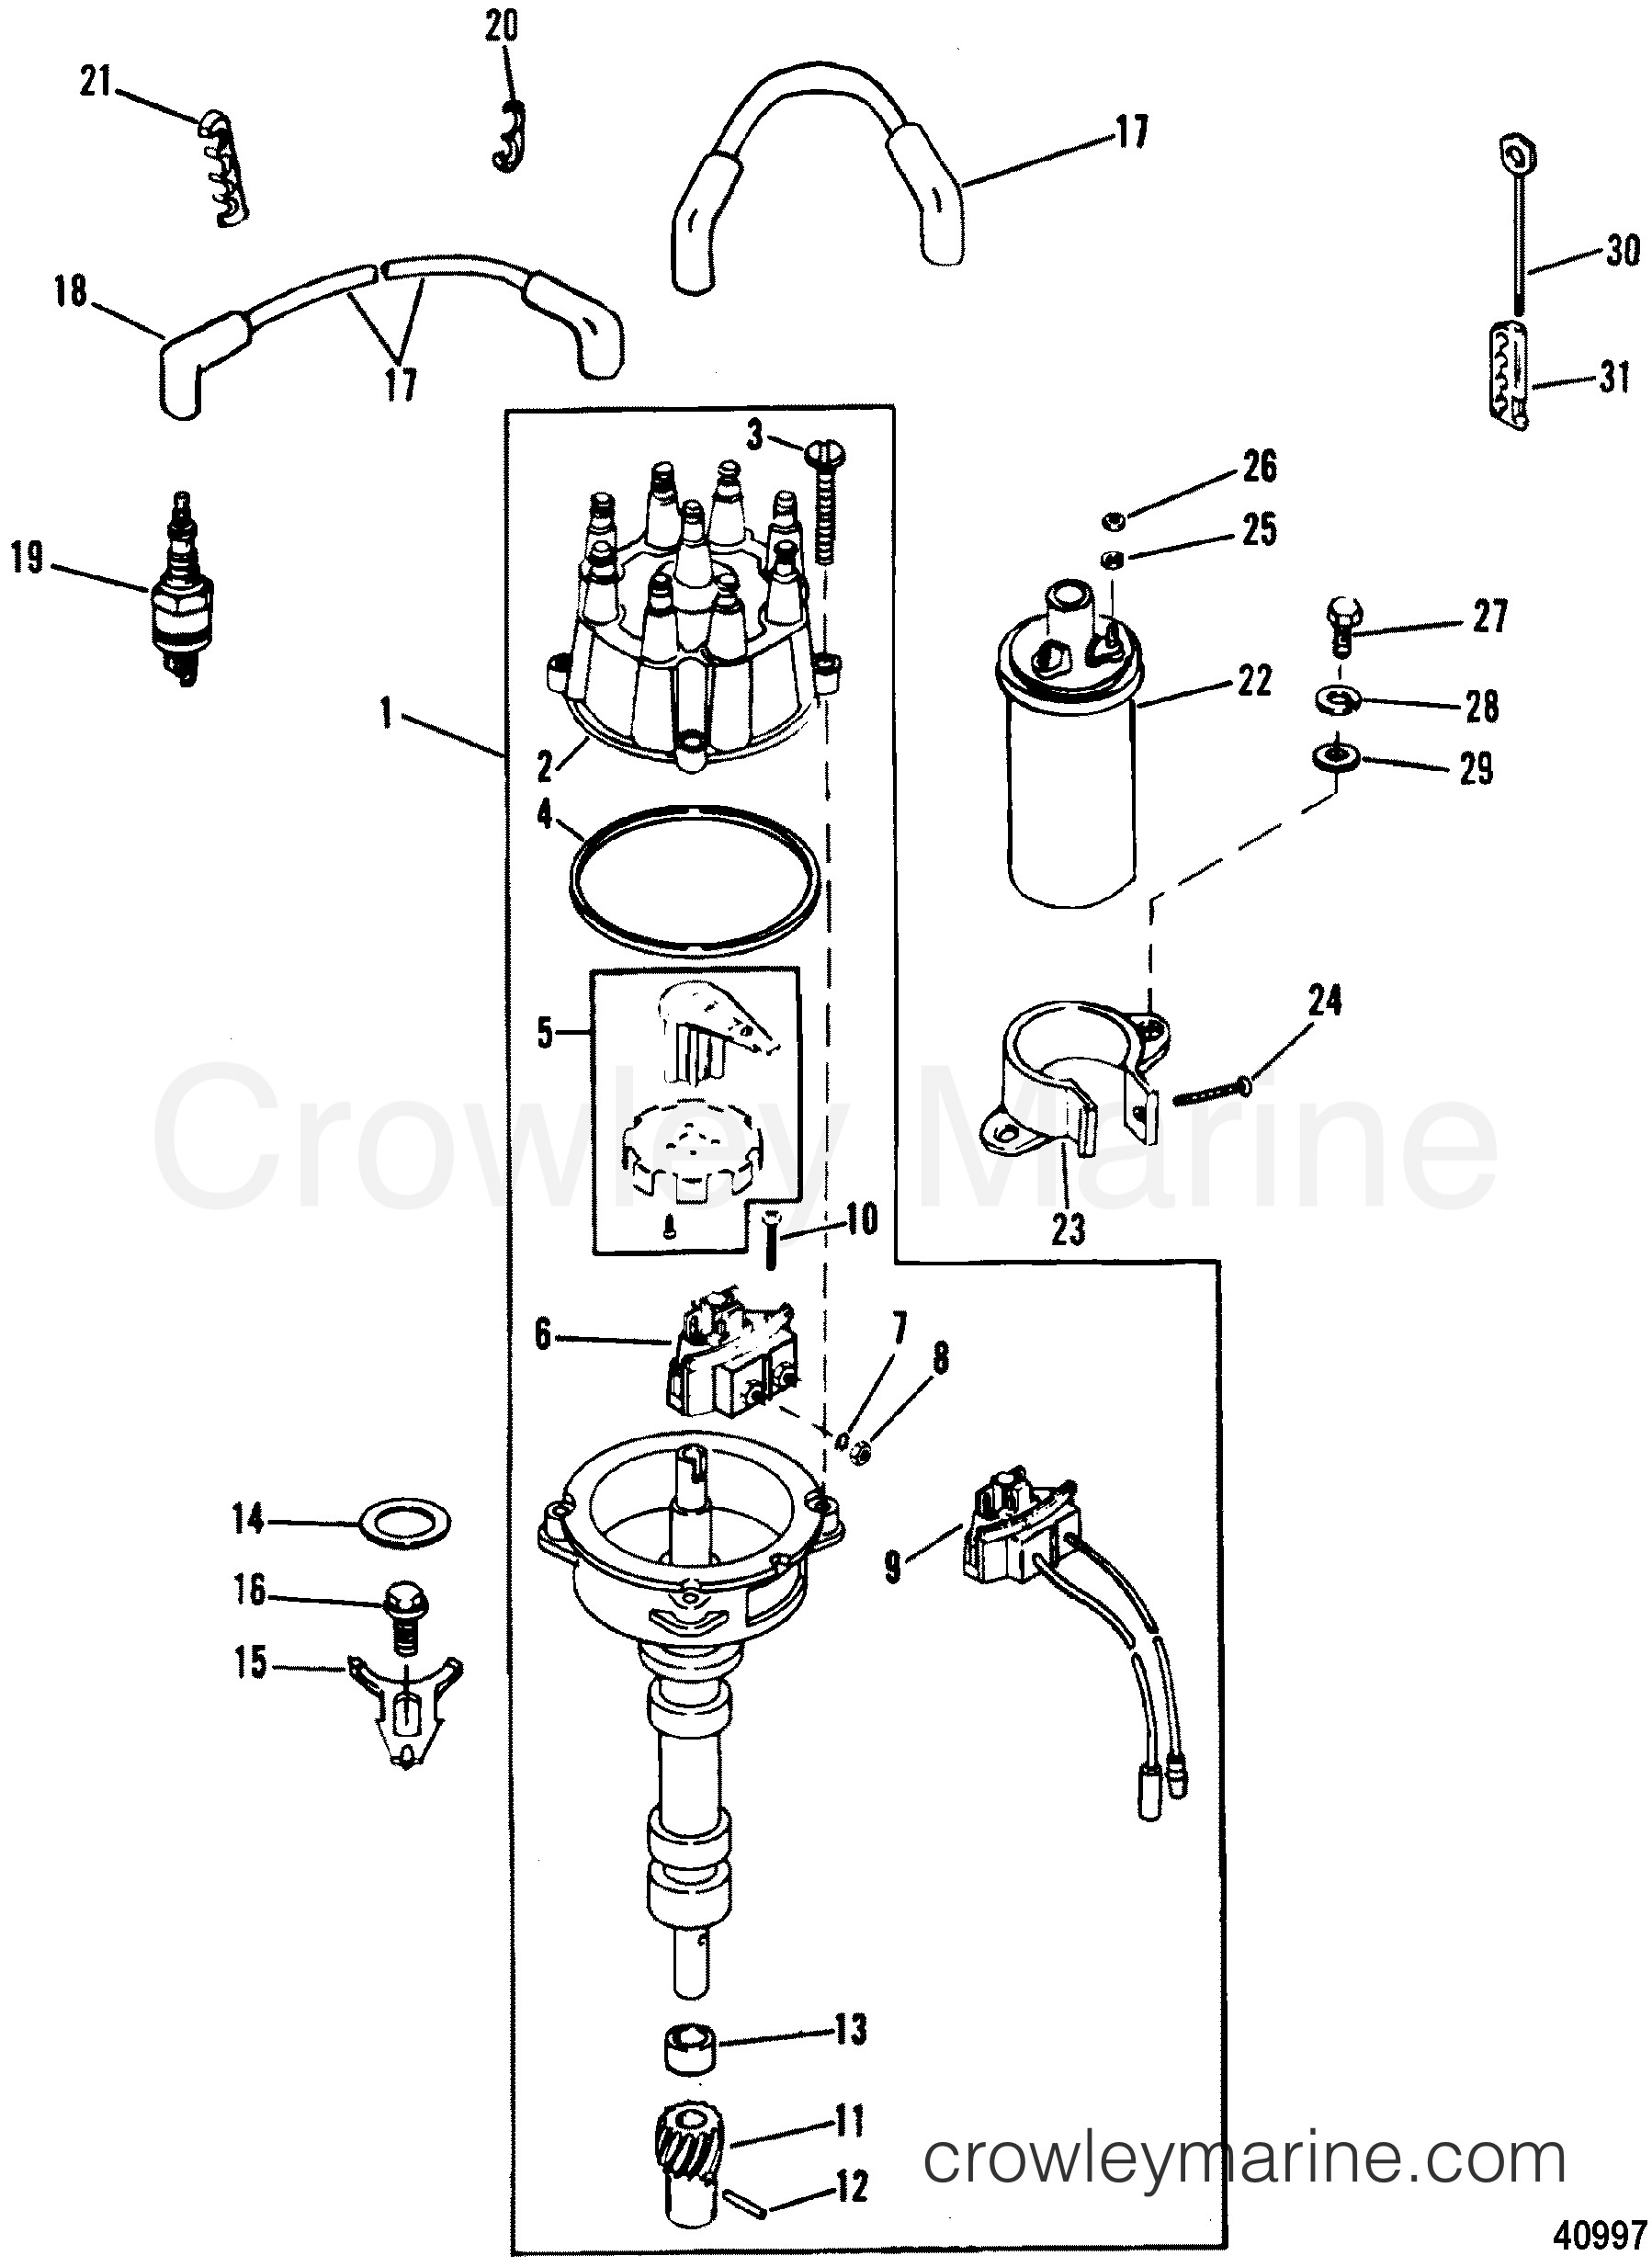 3 0 L Mercruiser Engine Diagram Distributor & Ignition Ponents Thunderbolt Iv Ignition 1988 Of 3 0 L Mercruiser Engine Diagram